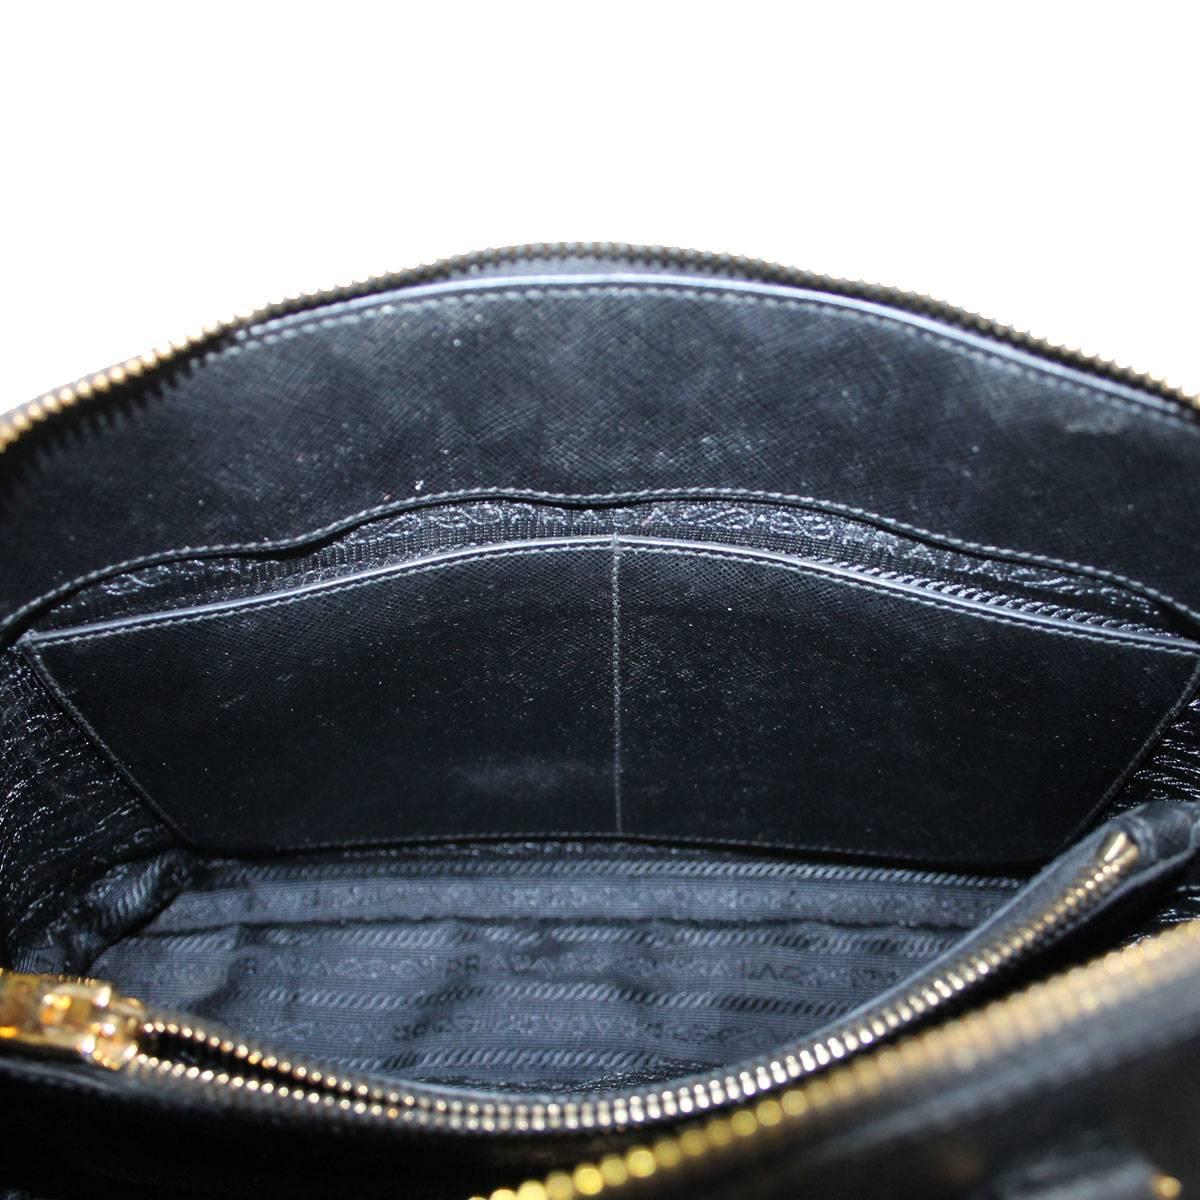 prada clutch black - Prada Saffiano Black Leather Double Zip-Top Tote Shoulder Bag at ...